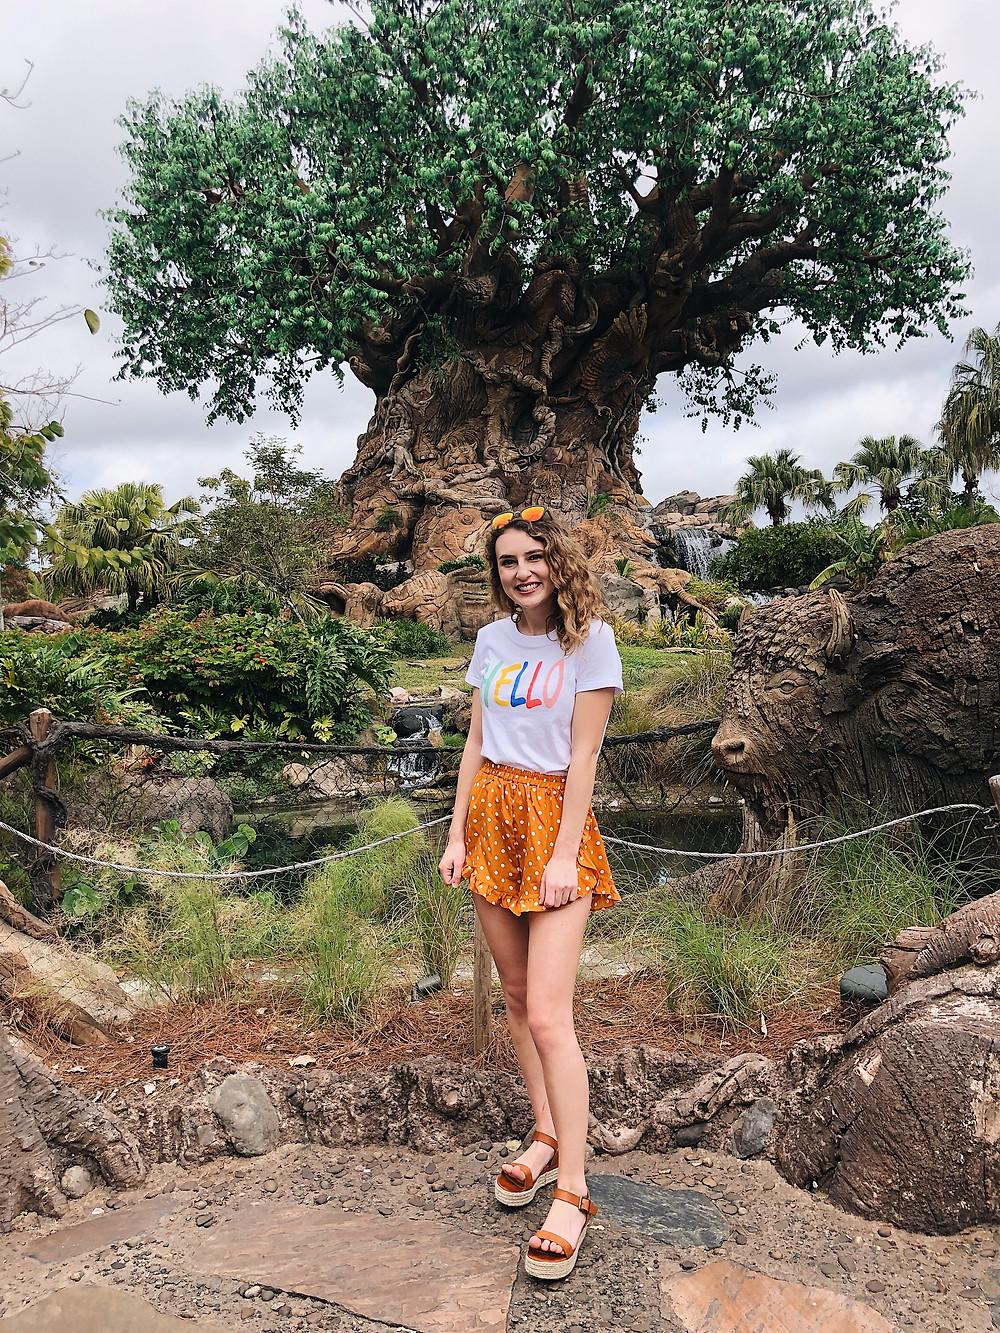 Abby Graf 2019, polka dot shorts, animal kingdom